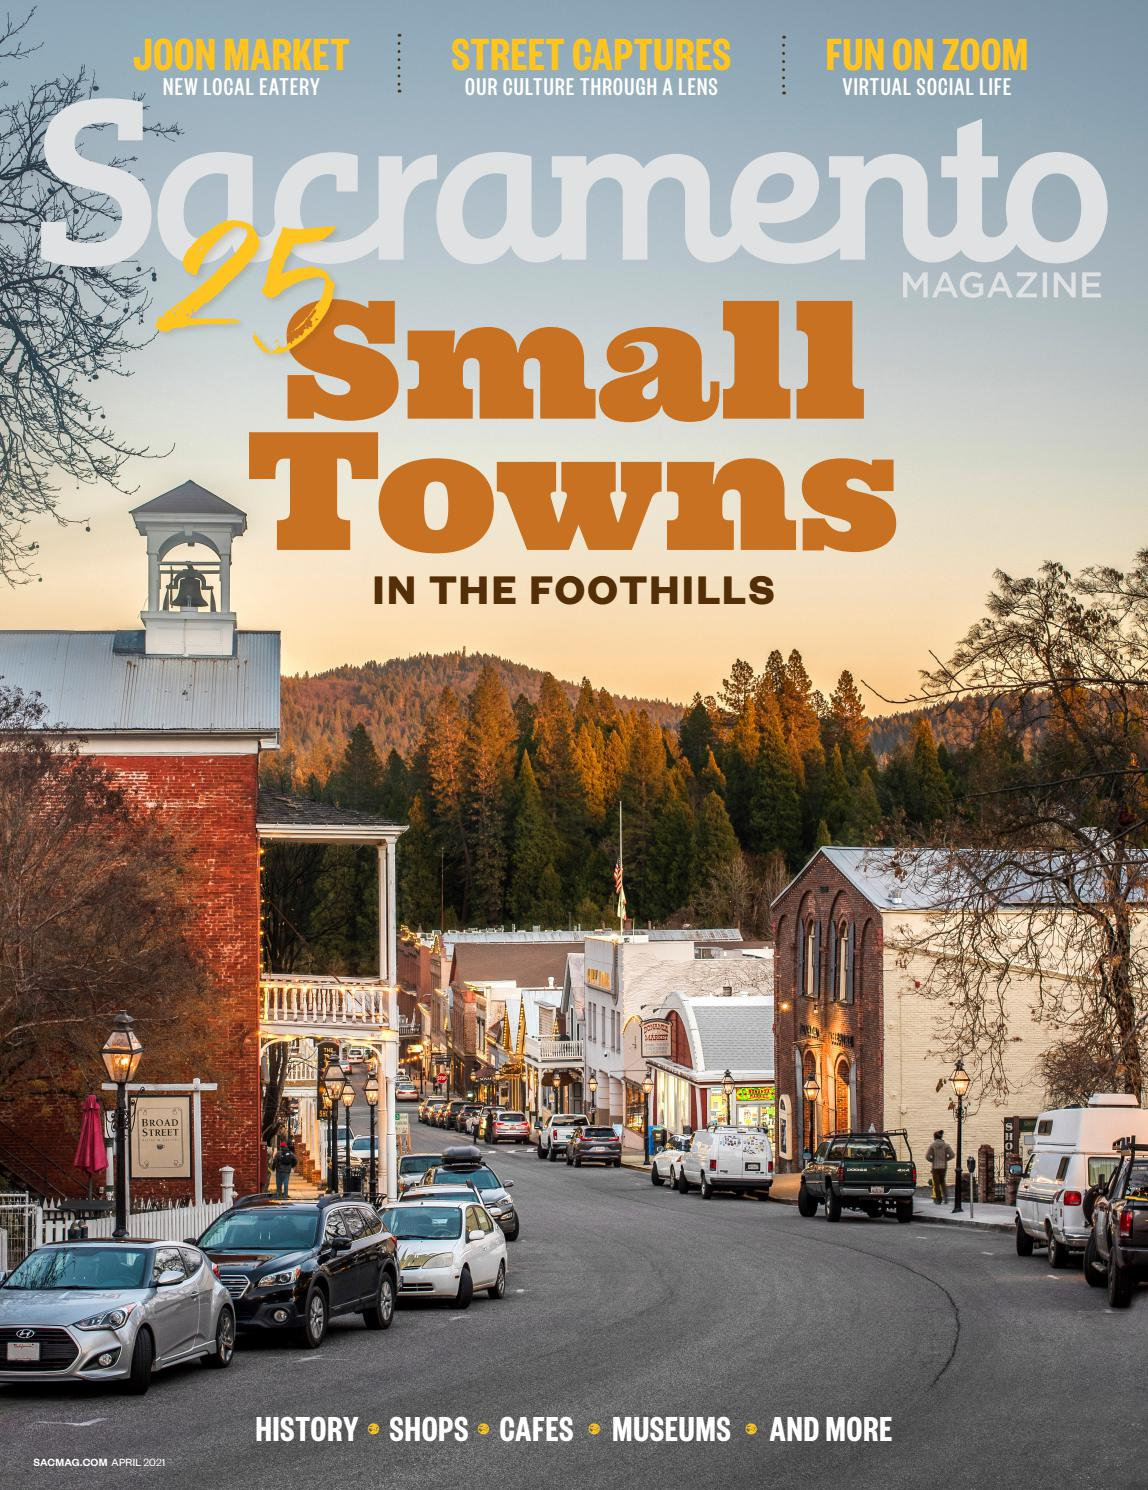 Sacramento Magazine April 2021 By Sacramento Magazine - Issuu